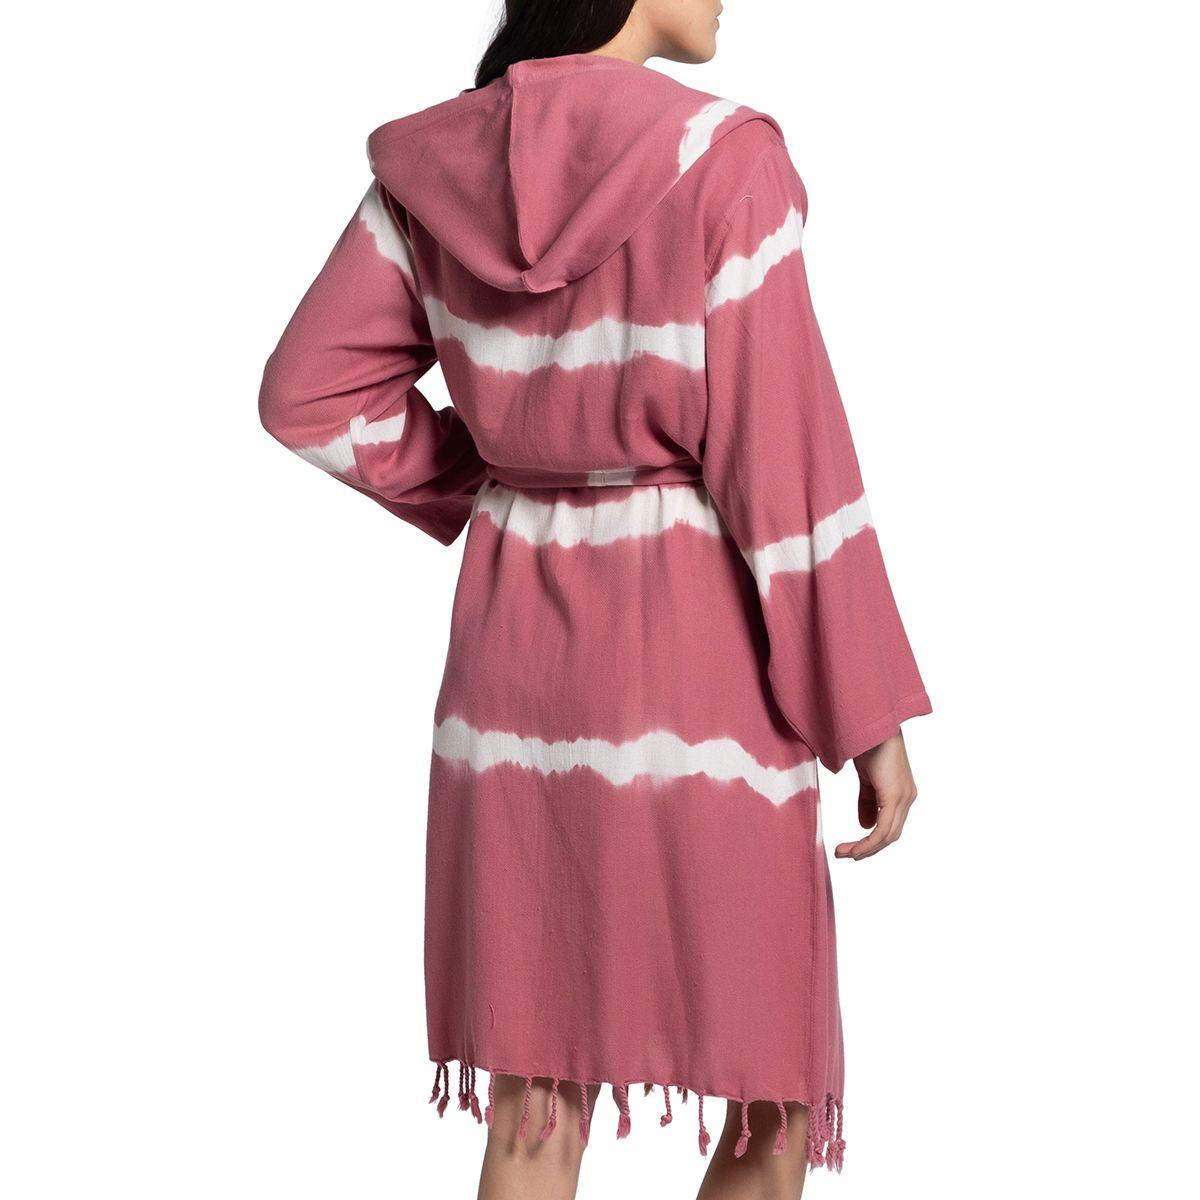 Bathrobe Tie Dye with hood - Dusty Rose Base